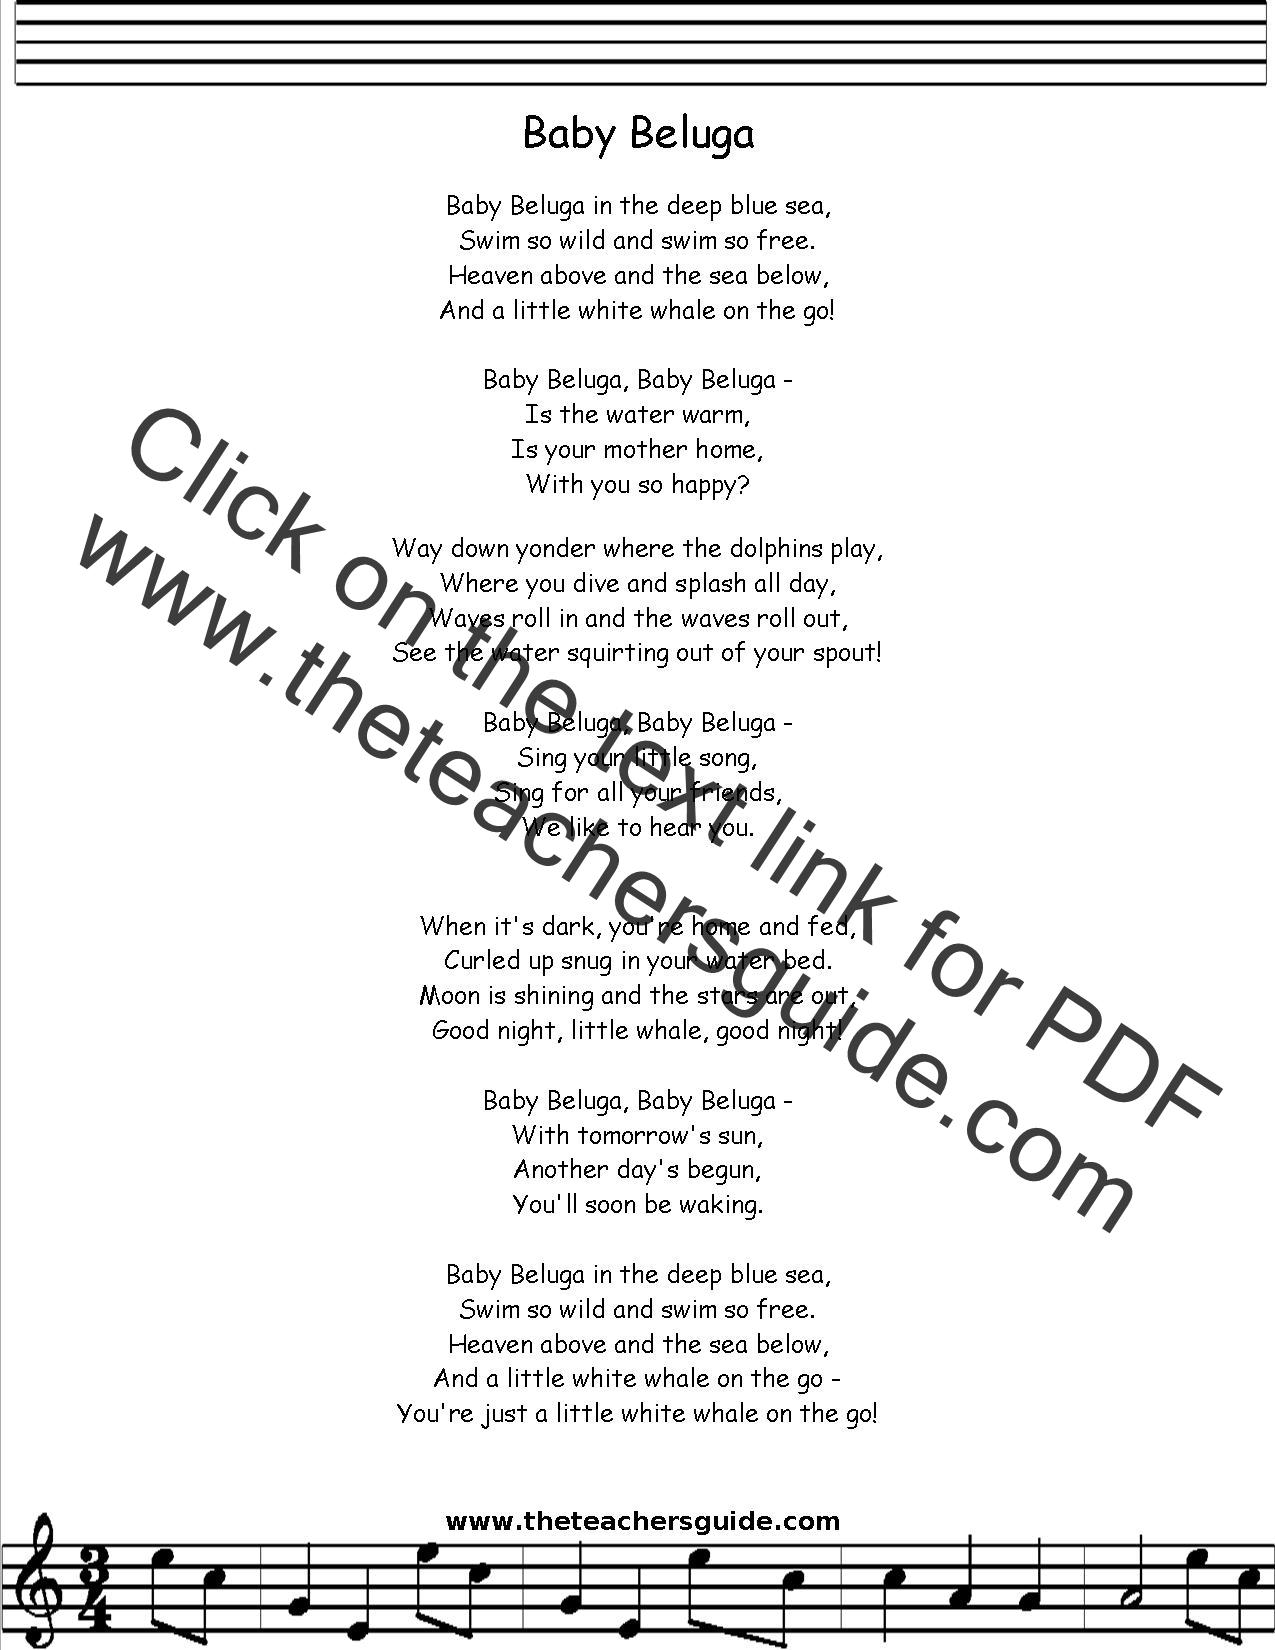 Baby Beluga Lyrics Printout Midi And Video